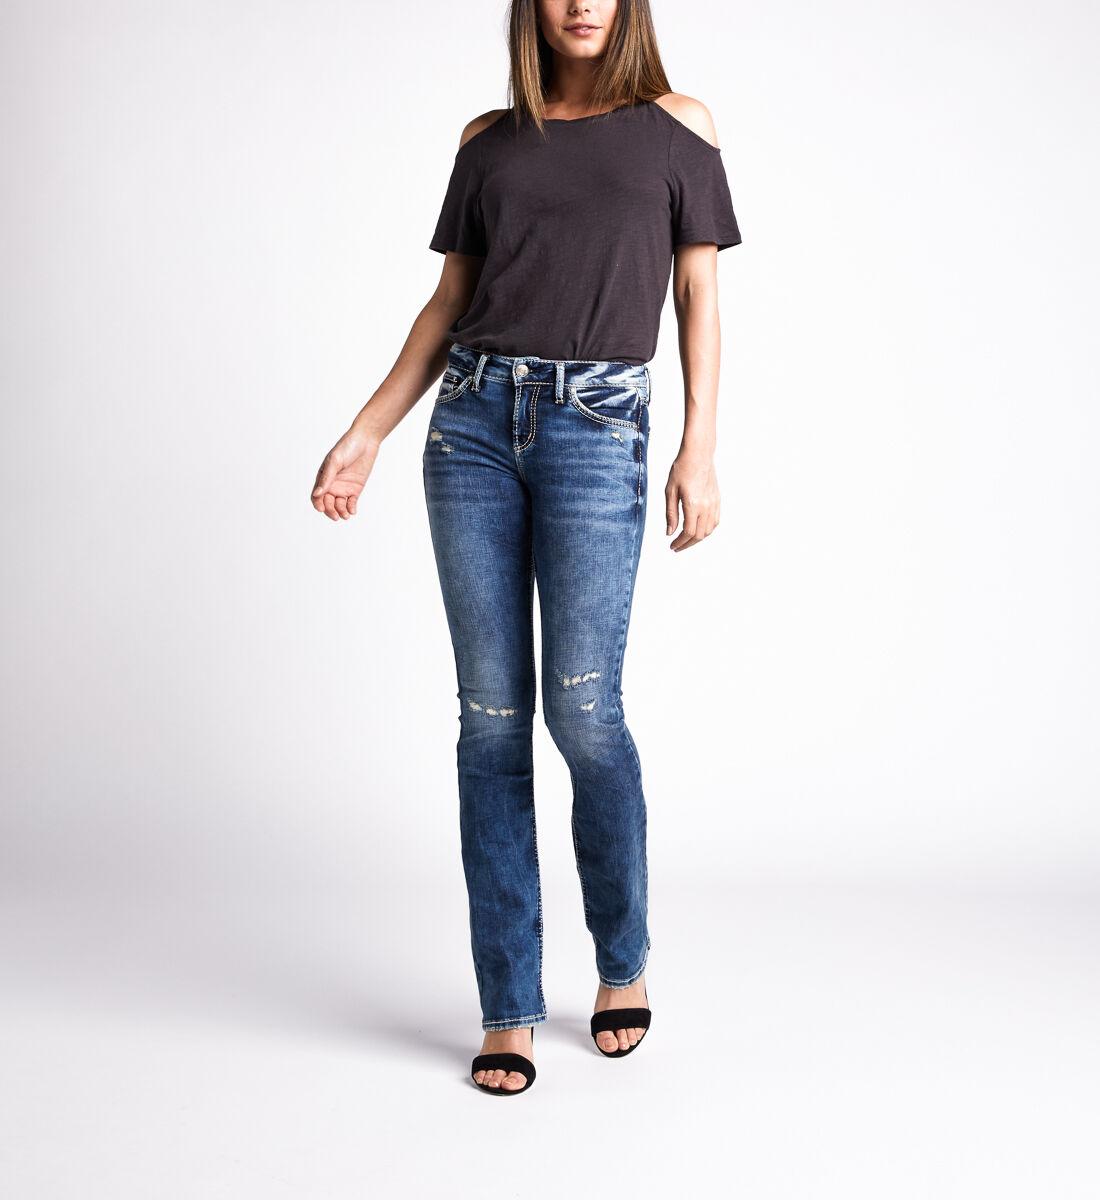 Avery High Rise Slim Bootcut Jeans,Indigo Alt Image 1